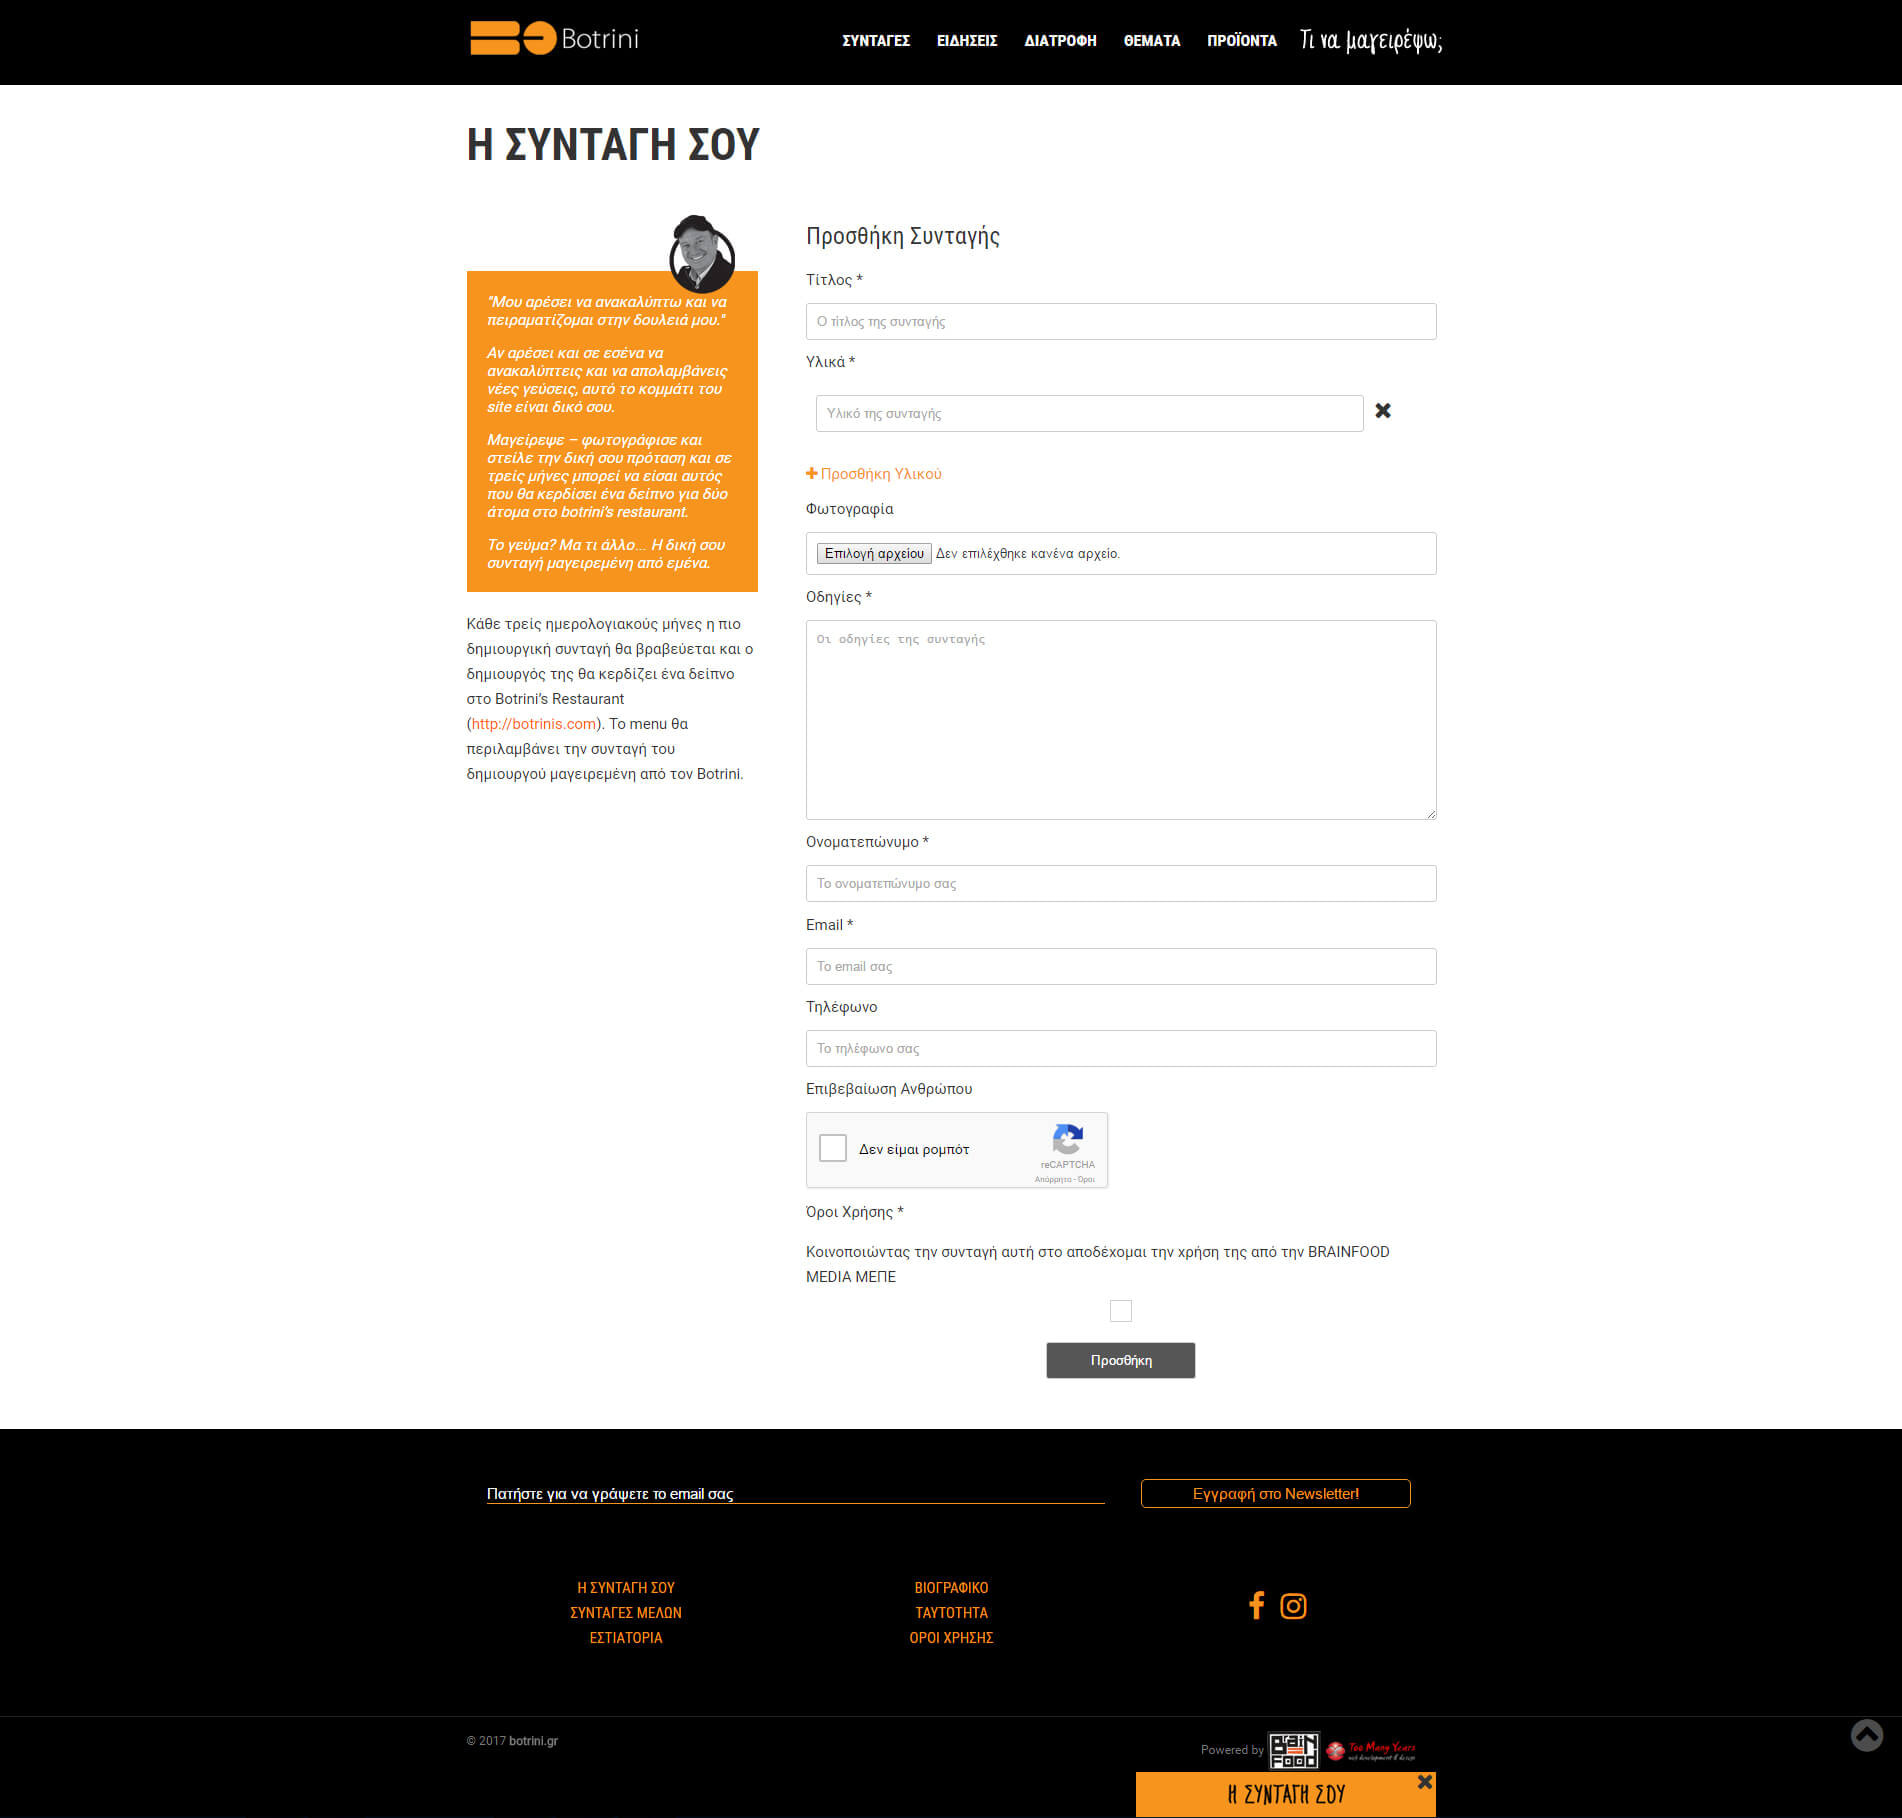 Botrini - TMY WEB Development